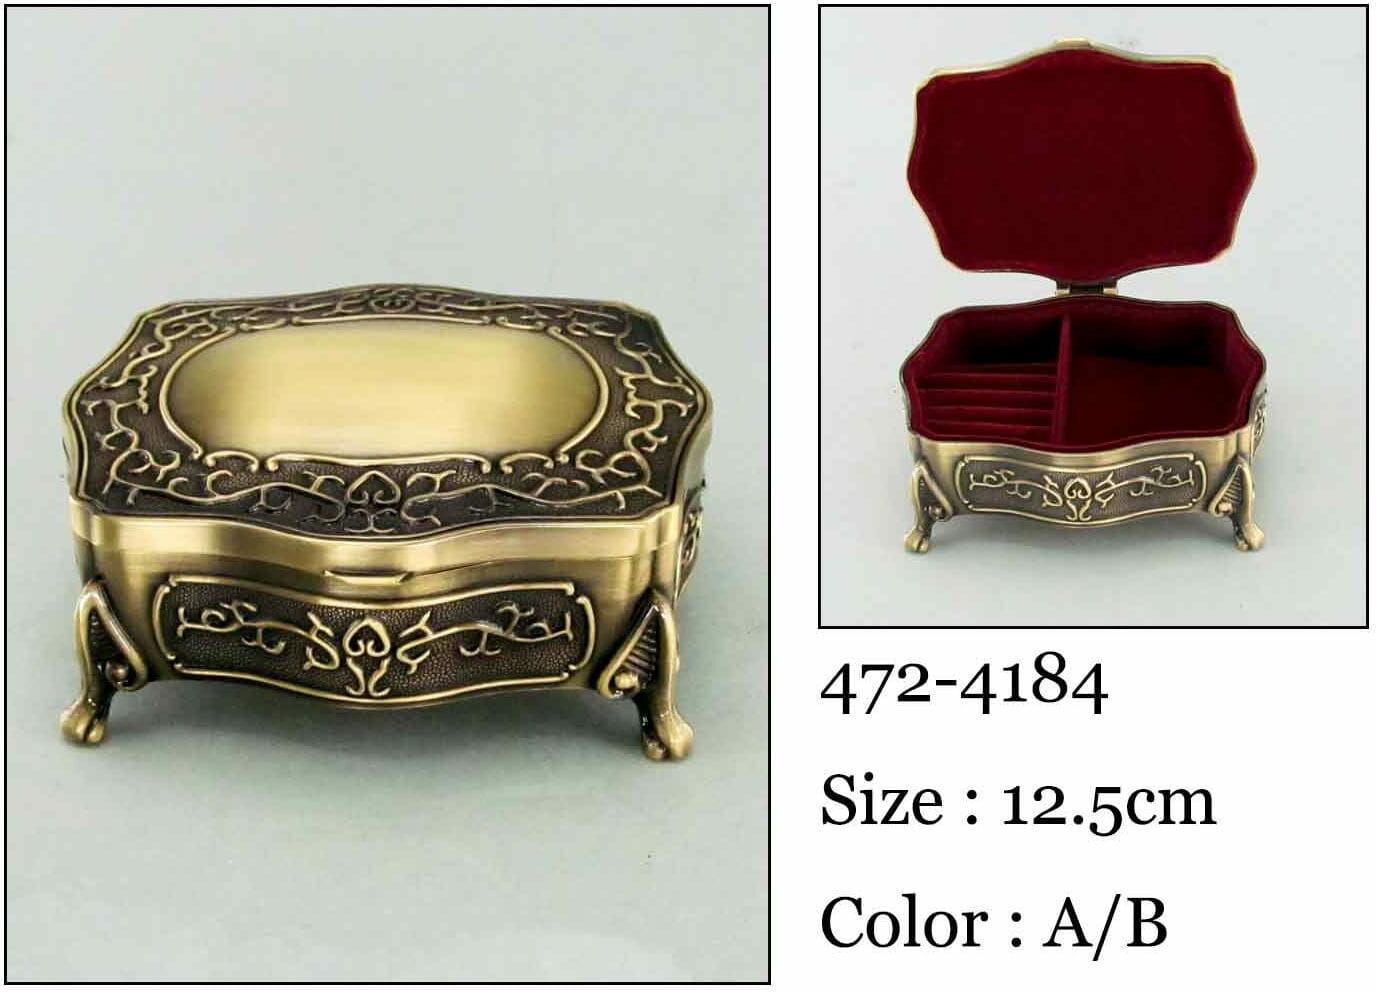 Kasetka, stare złoto, 12x9,5 cm